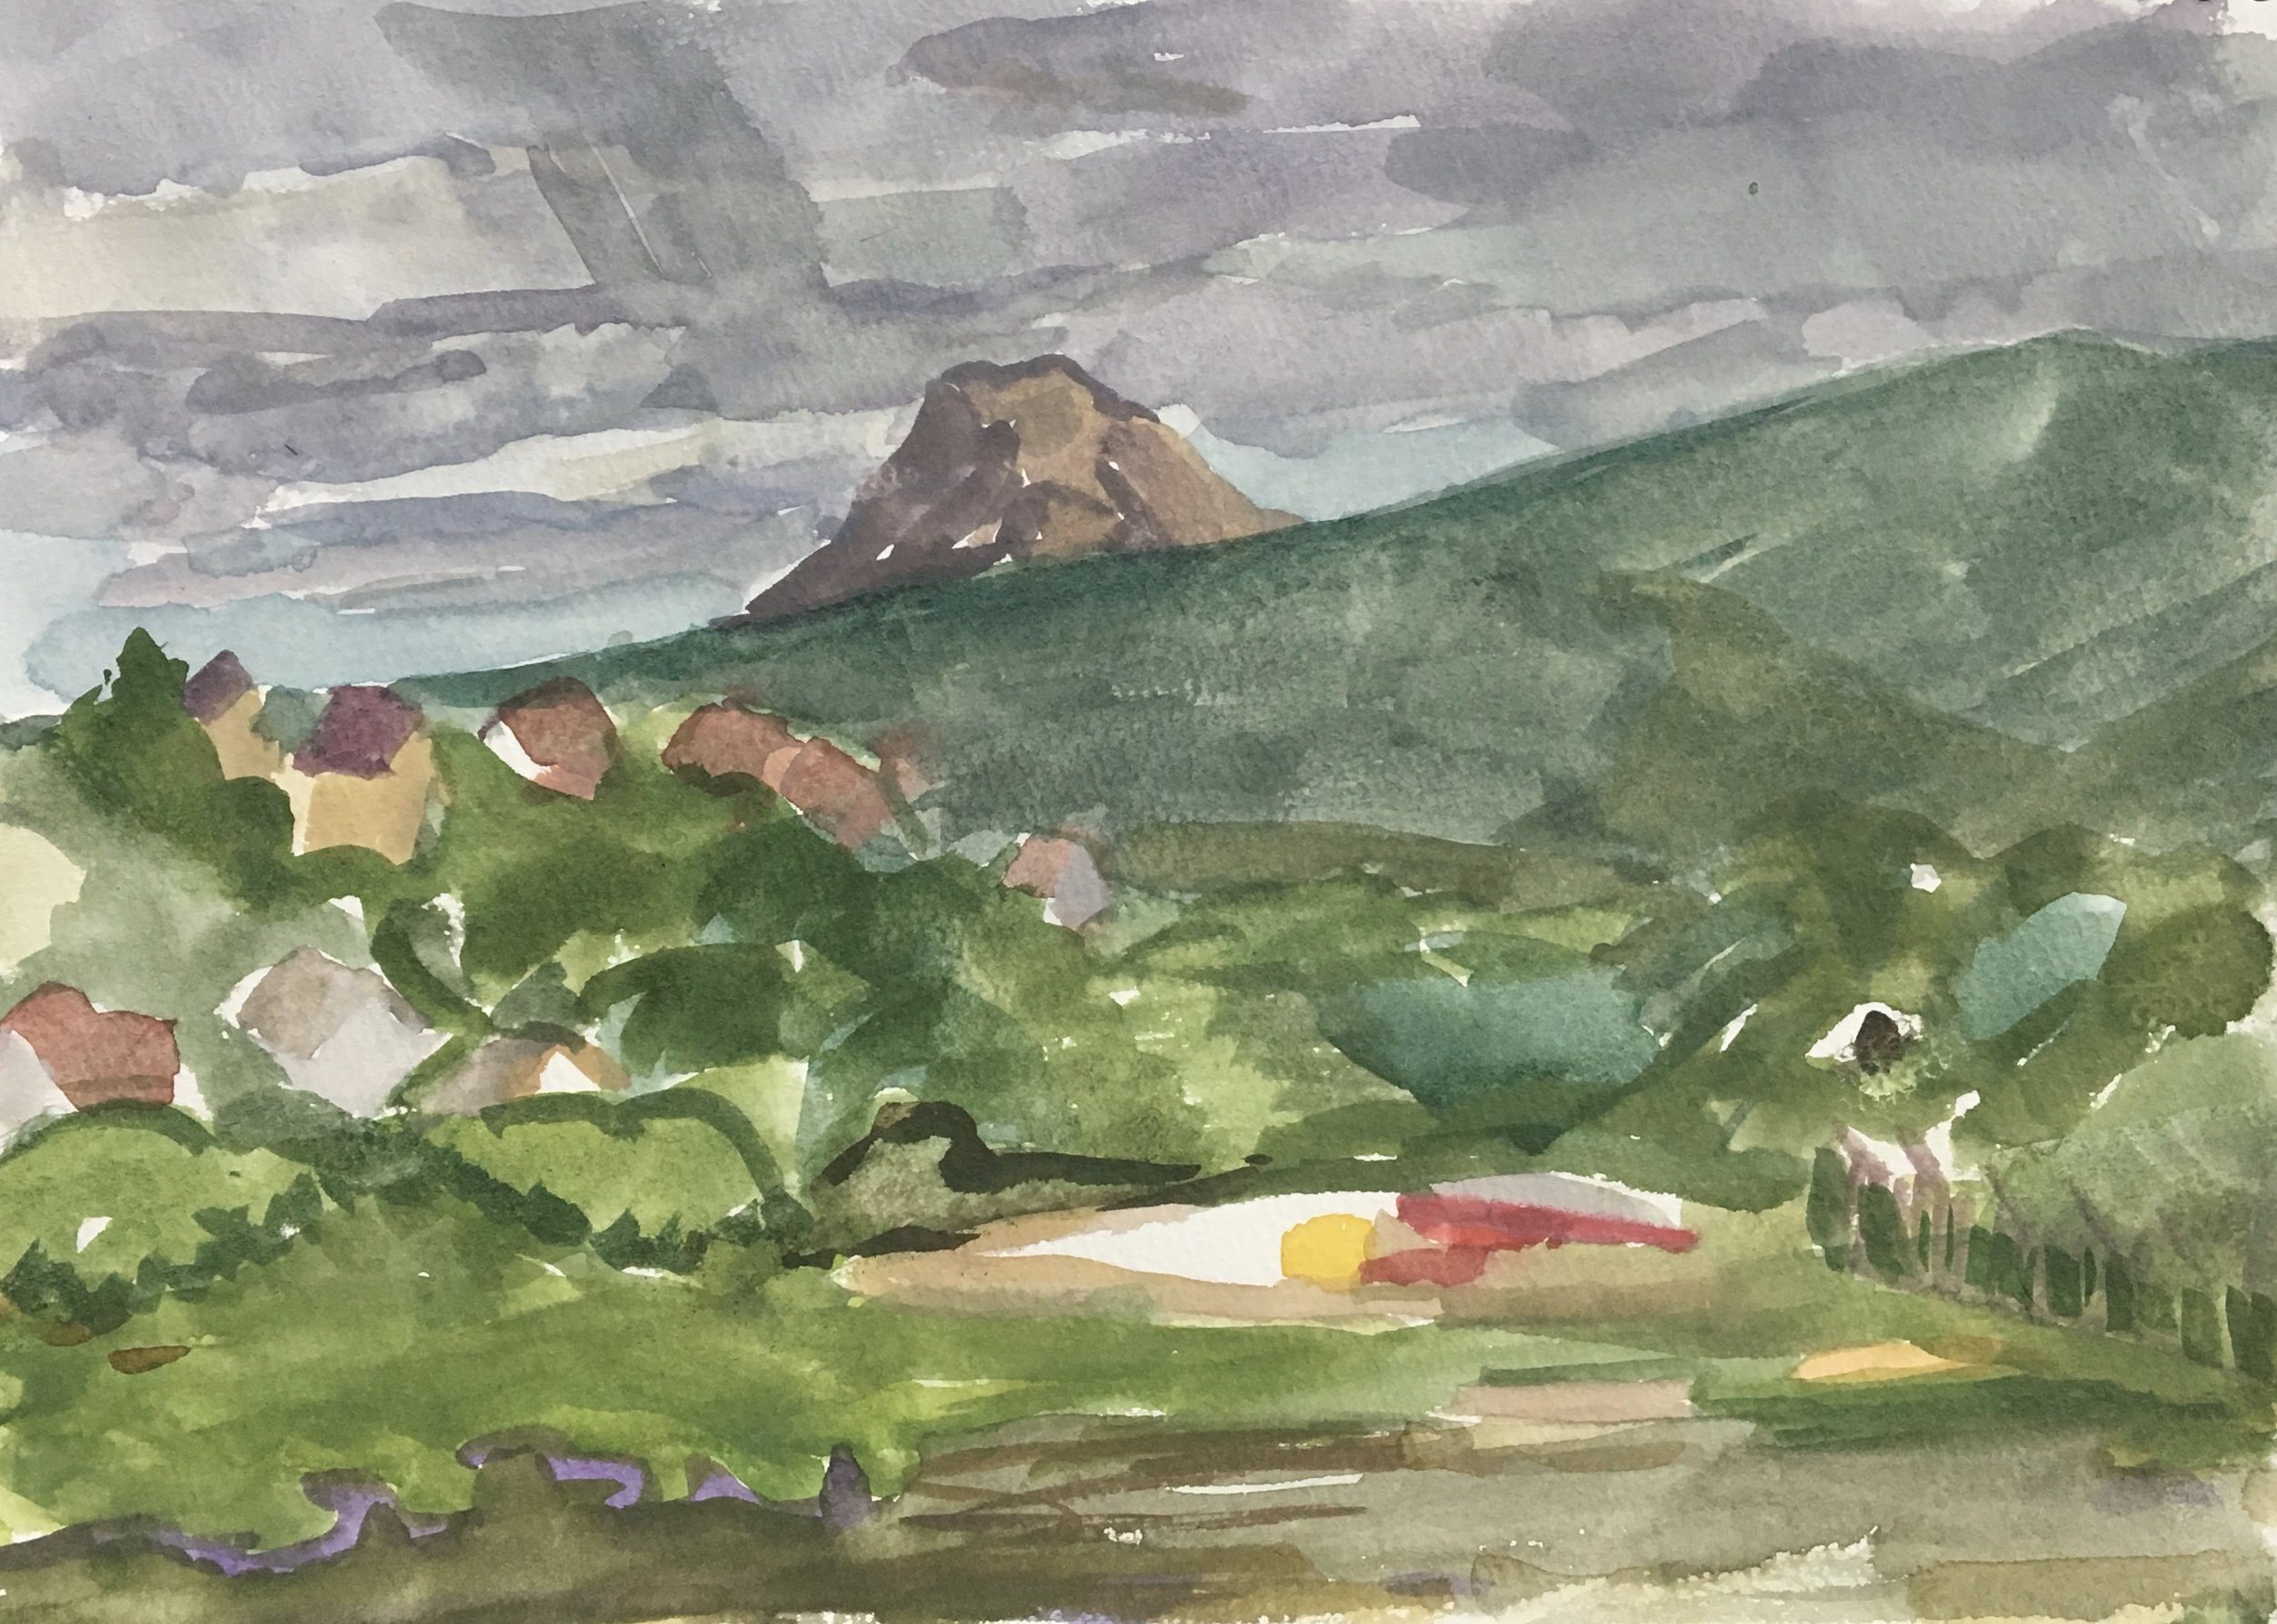 Mt. Errigal, Annagary, Donetal, Ireland, 2017